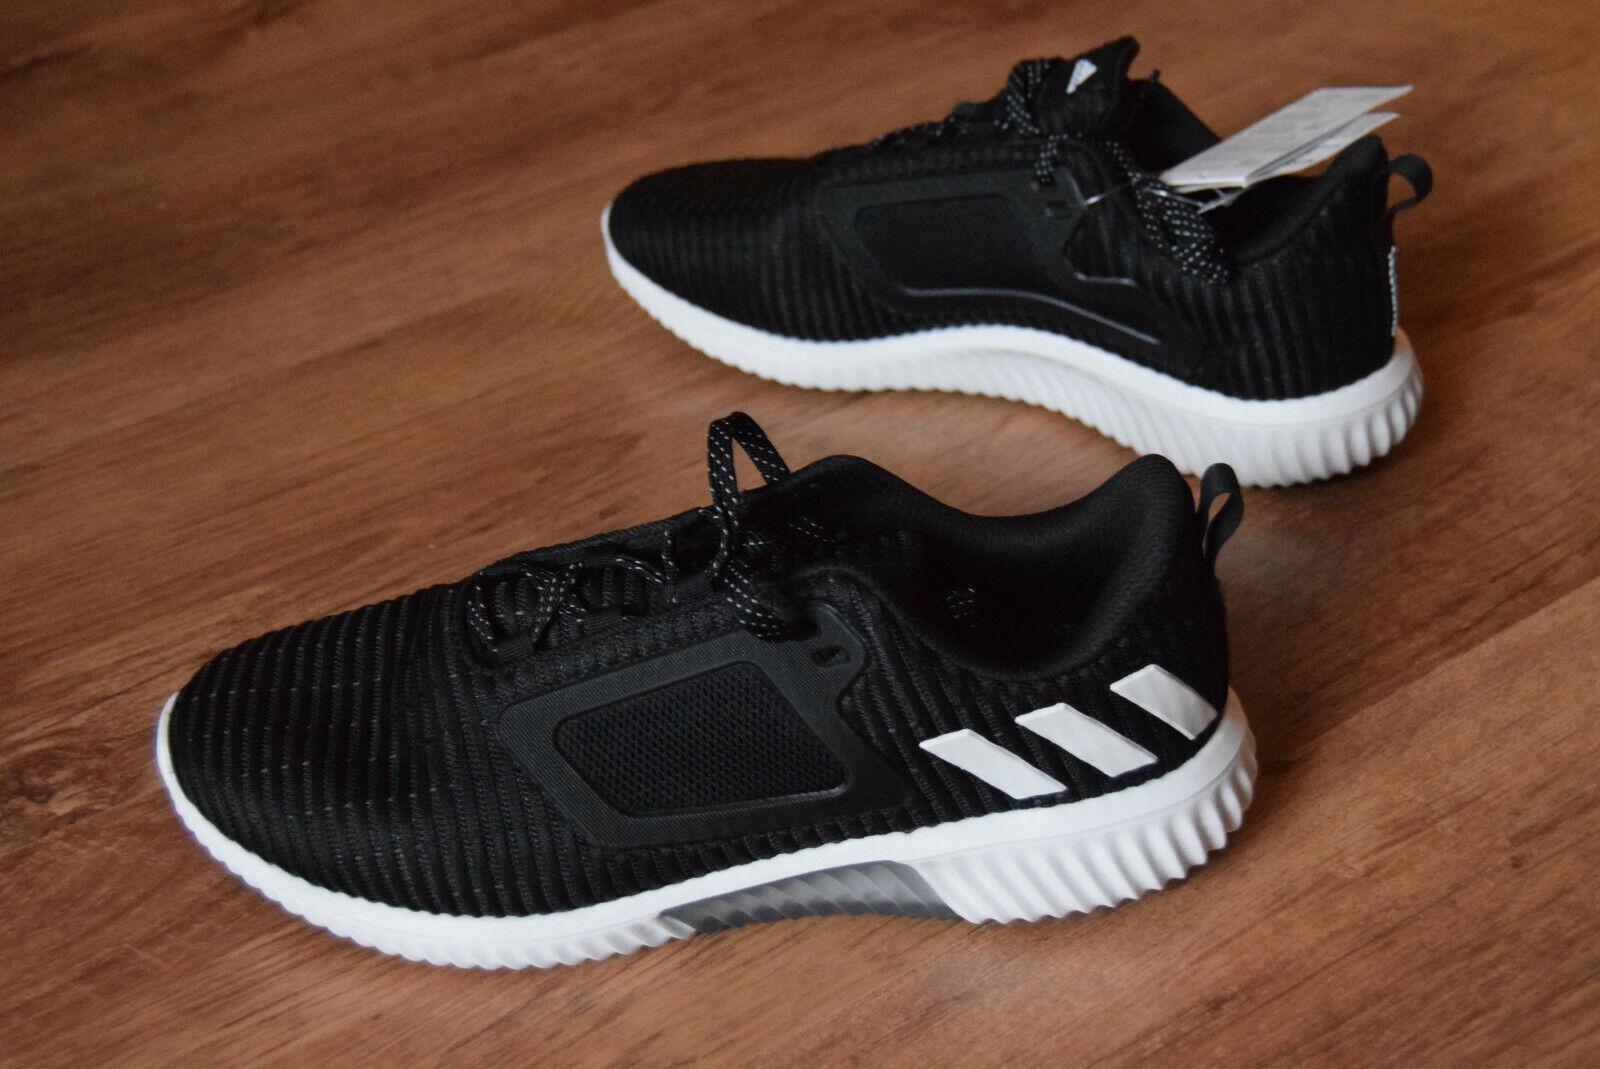 Adidas Climacool M 45 46 Cm7405 Clima Cool Cc1 cc 1